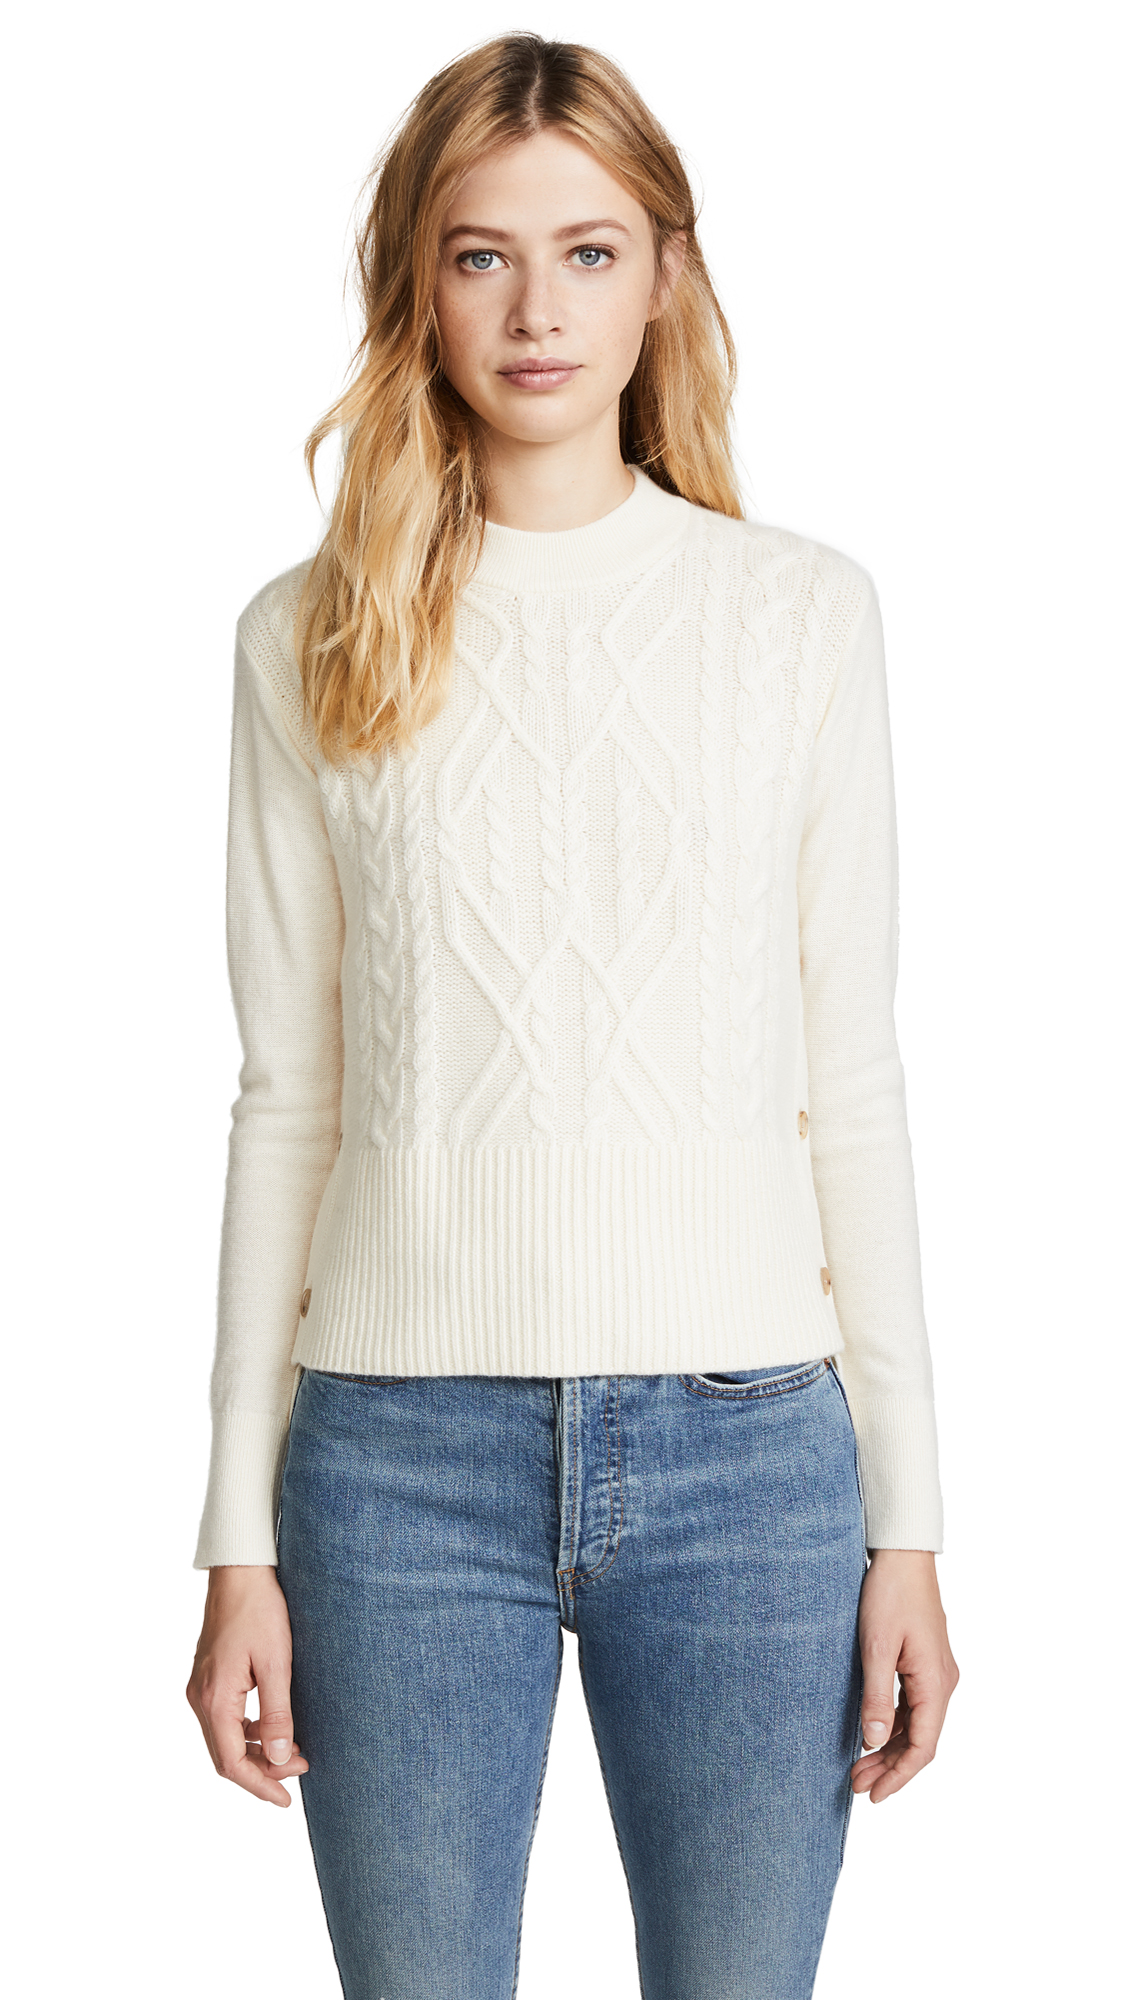 Veronica Beard Kenna Sweater - Ivory